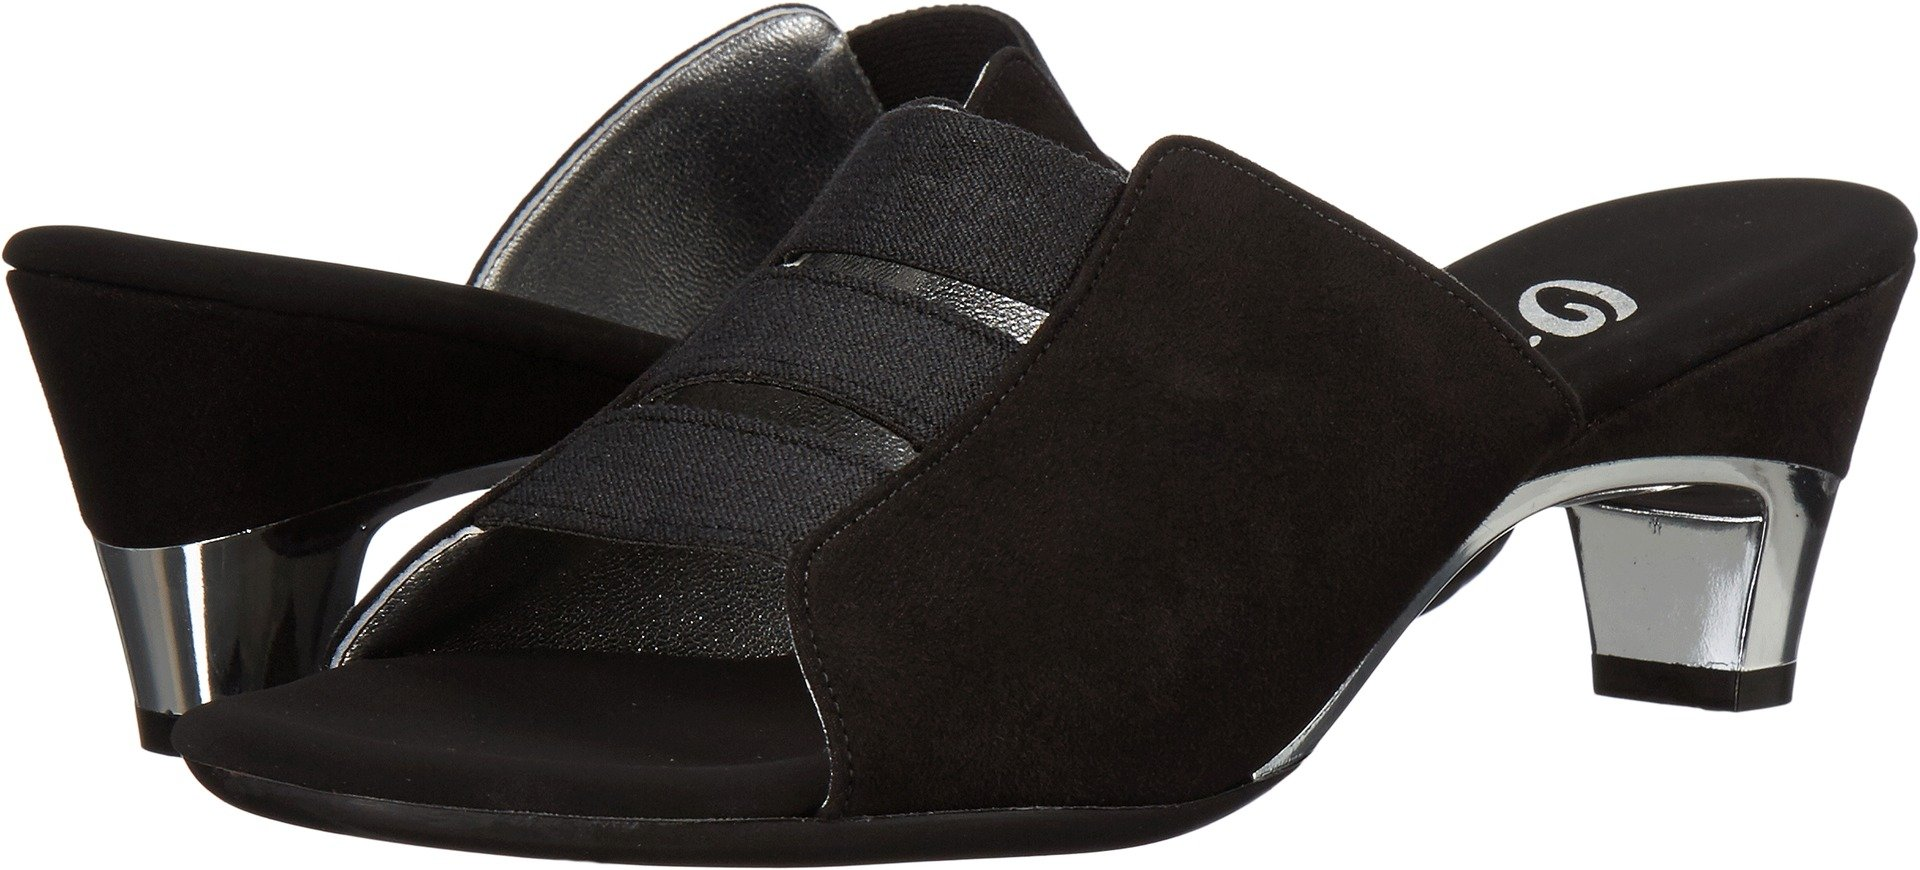 Onex Women's Selma Black Suede Sandal by Onex